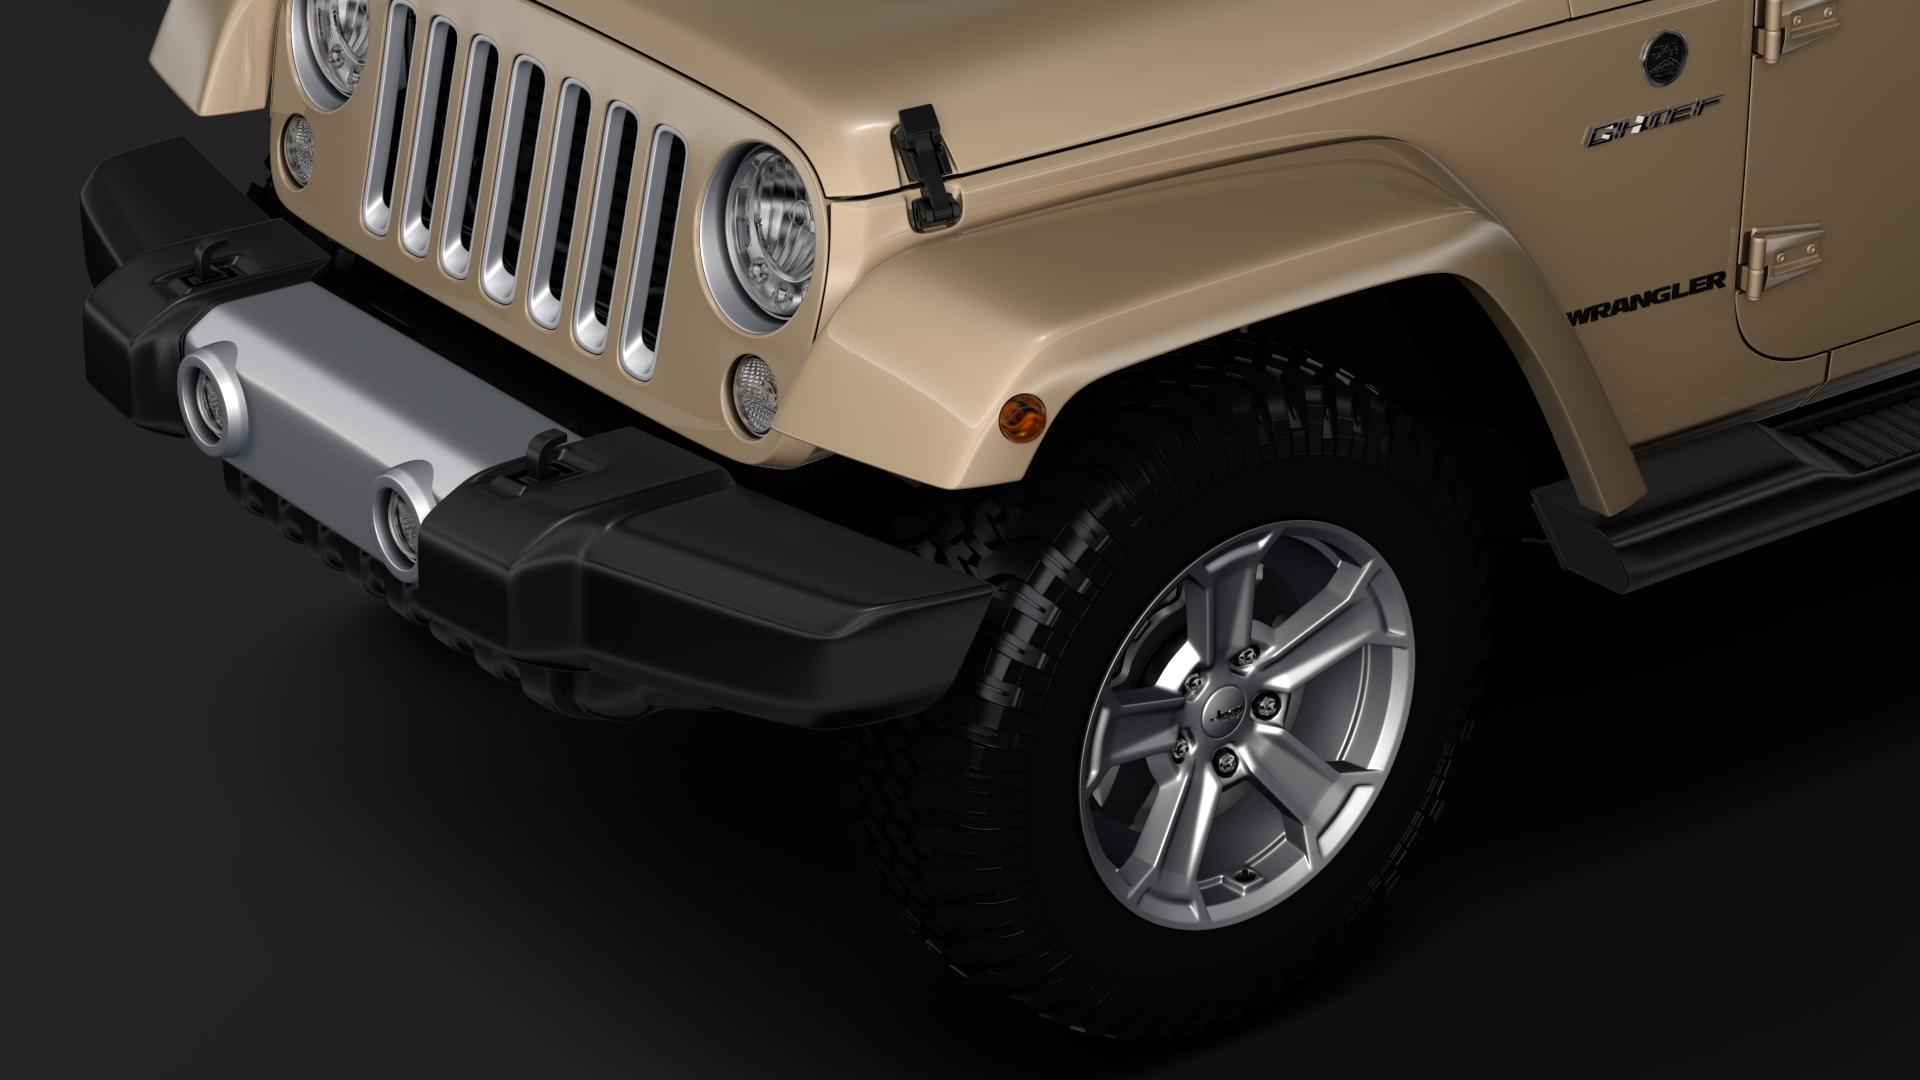 jeep wrangler chief jk 2017 3d model max fbx c4d lwo ma mb hrc xsi obj 276878